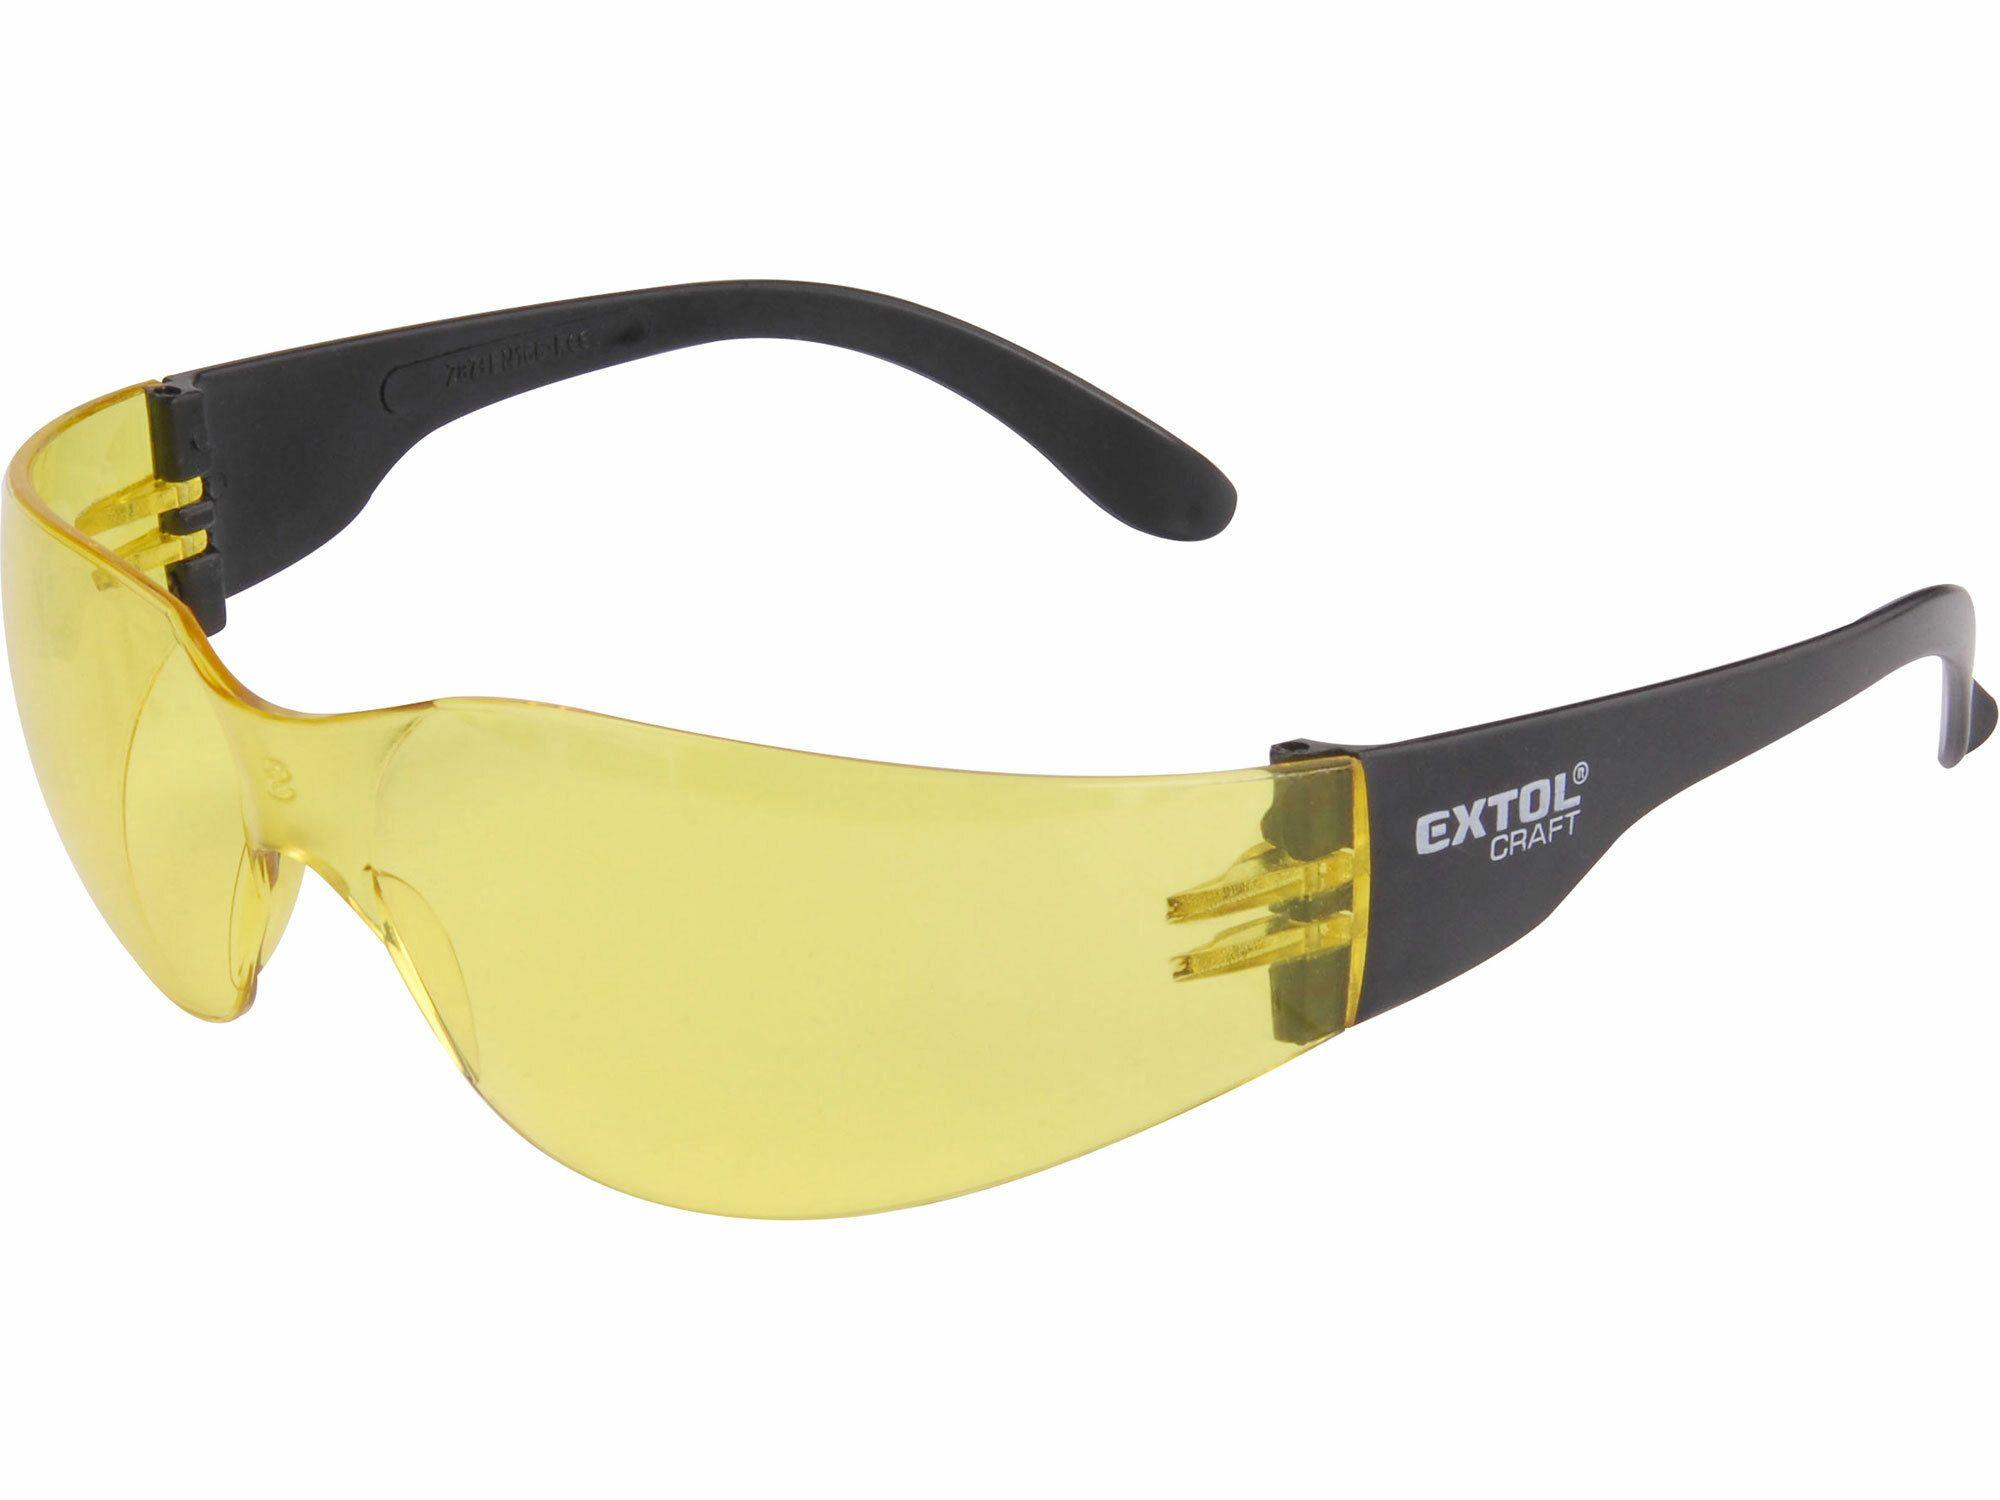 Brýle ochranné, žluté EXTOL-CRAFT